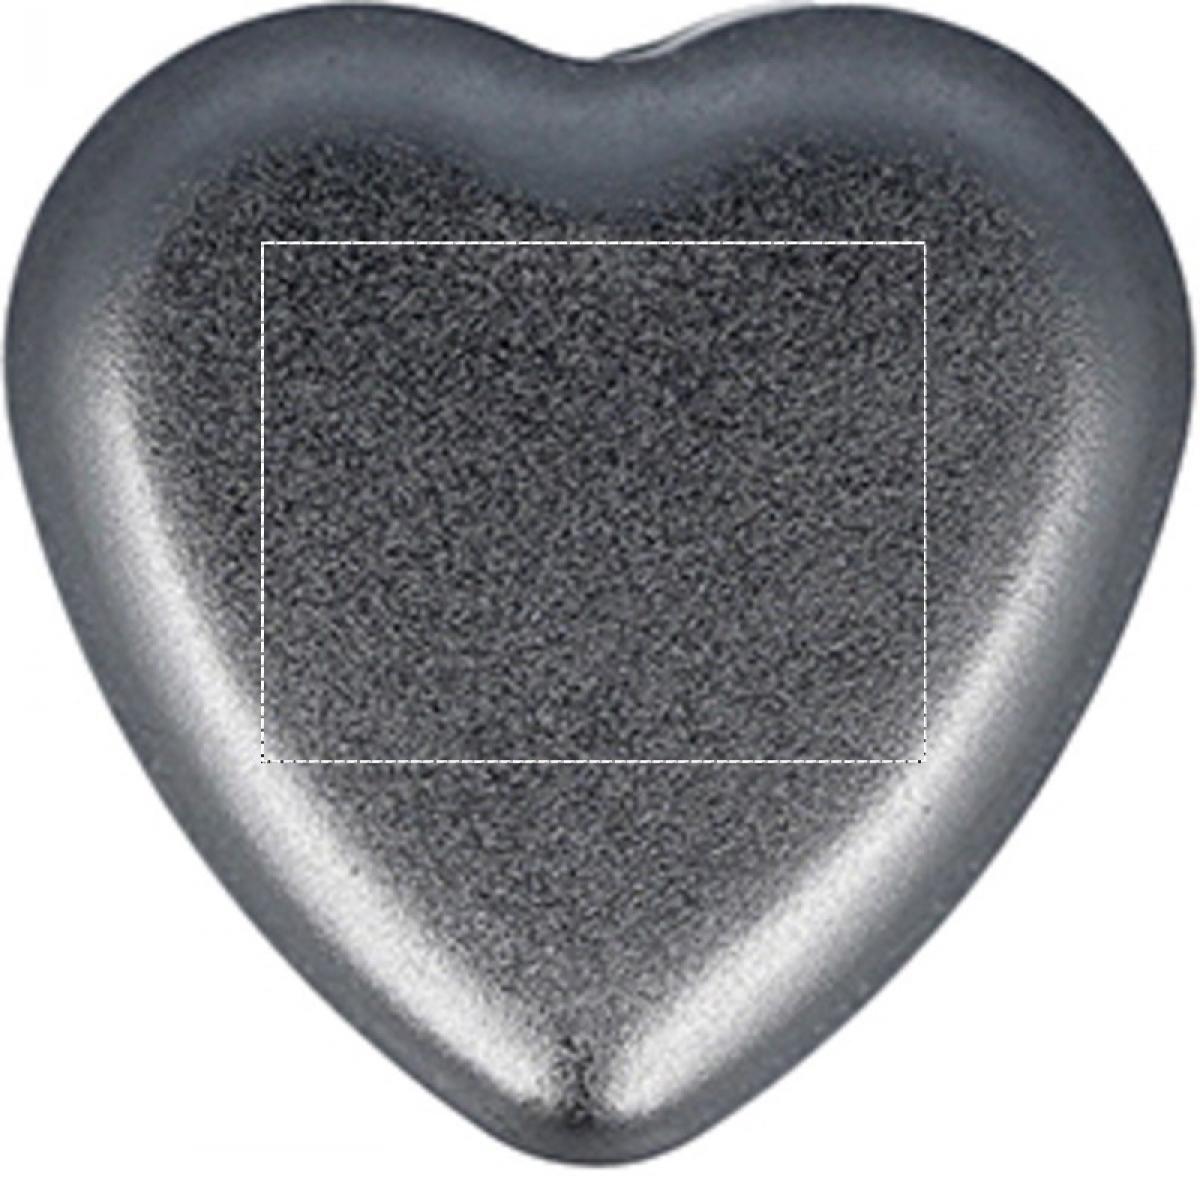 Balmo coeur lippenbalsem - Top